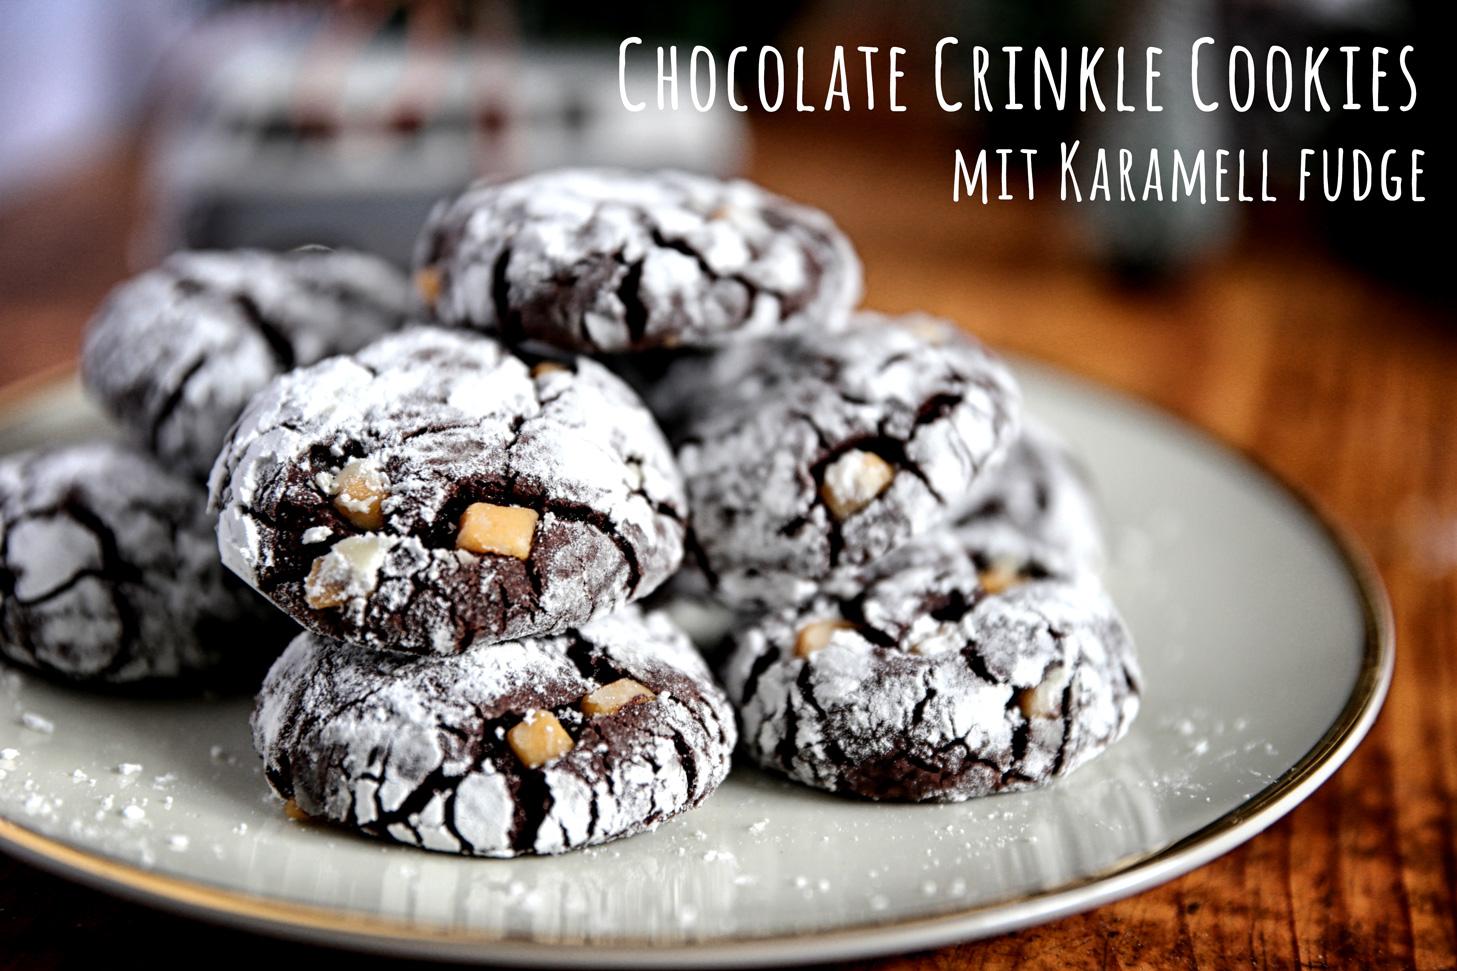 Chocolate Crinkle Cookies mit Salz-Karamell-Fudge